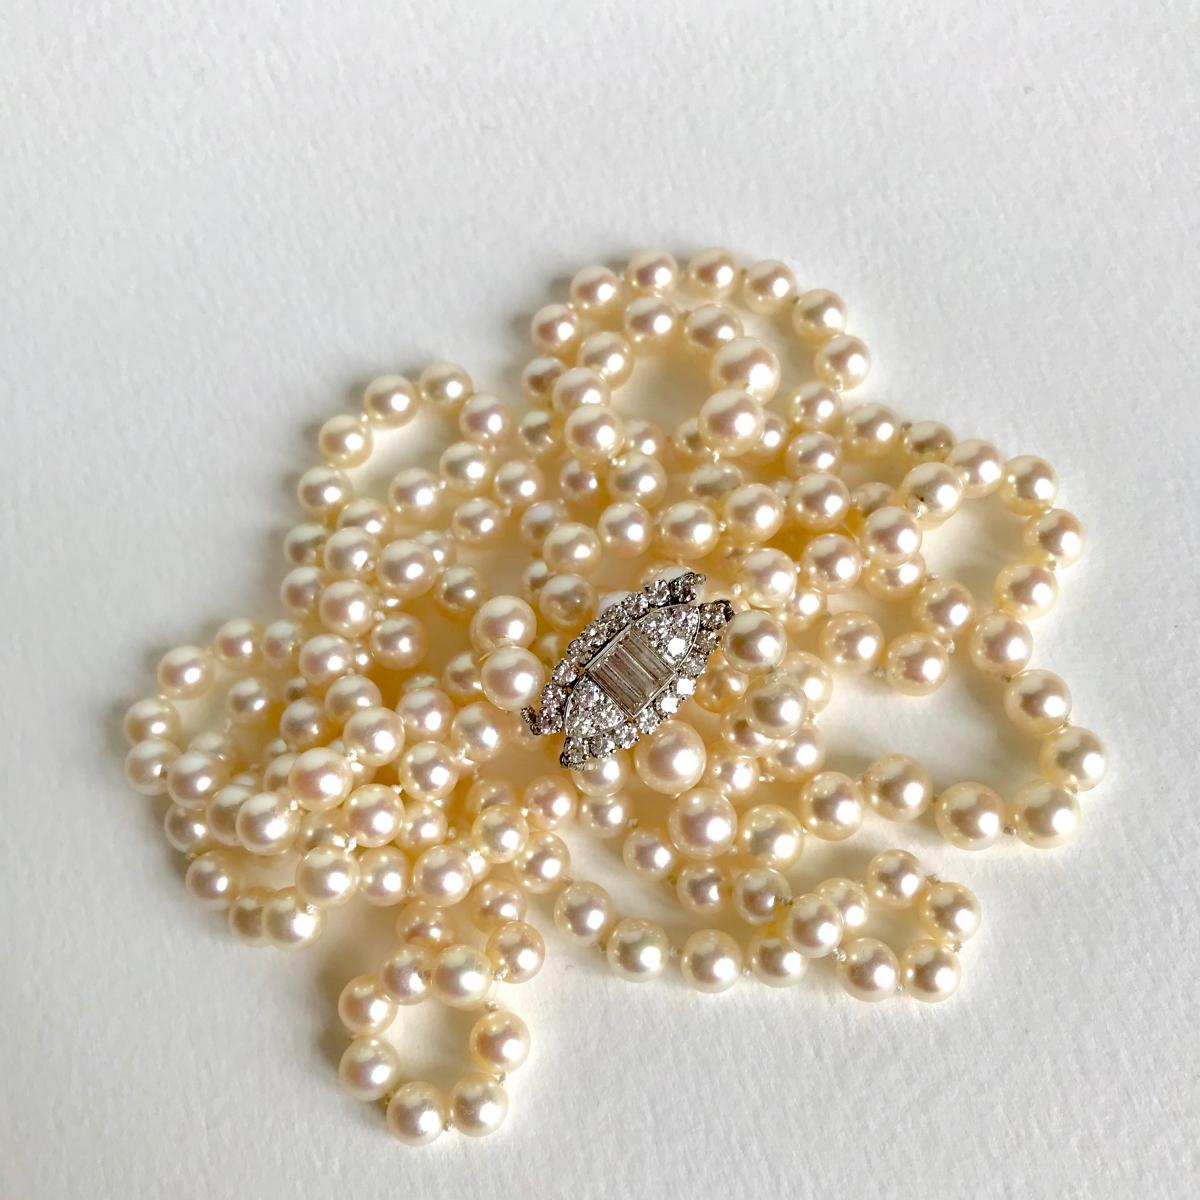 Necklace Pearl Necklace 2 Rows Van Cleef & Arpels-photo-1